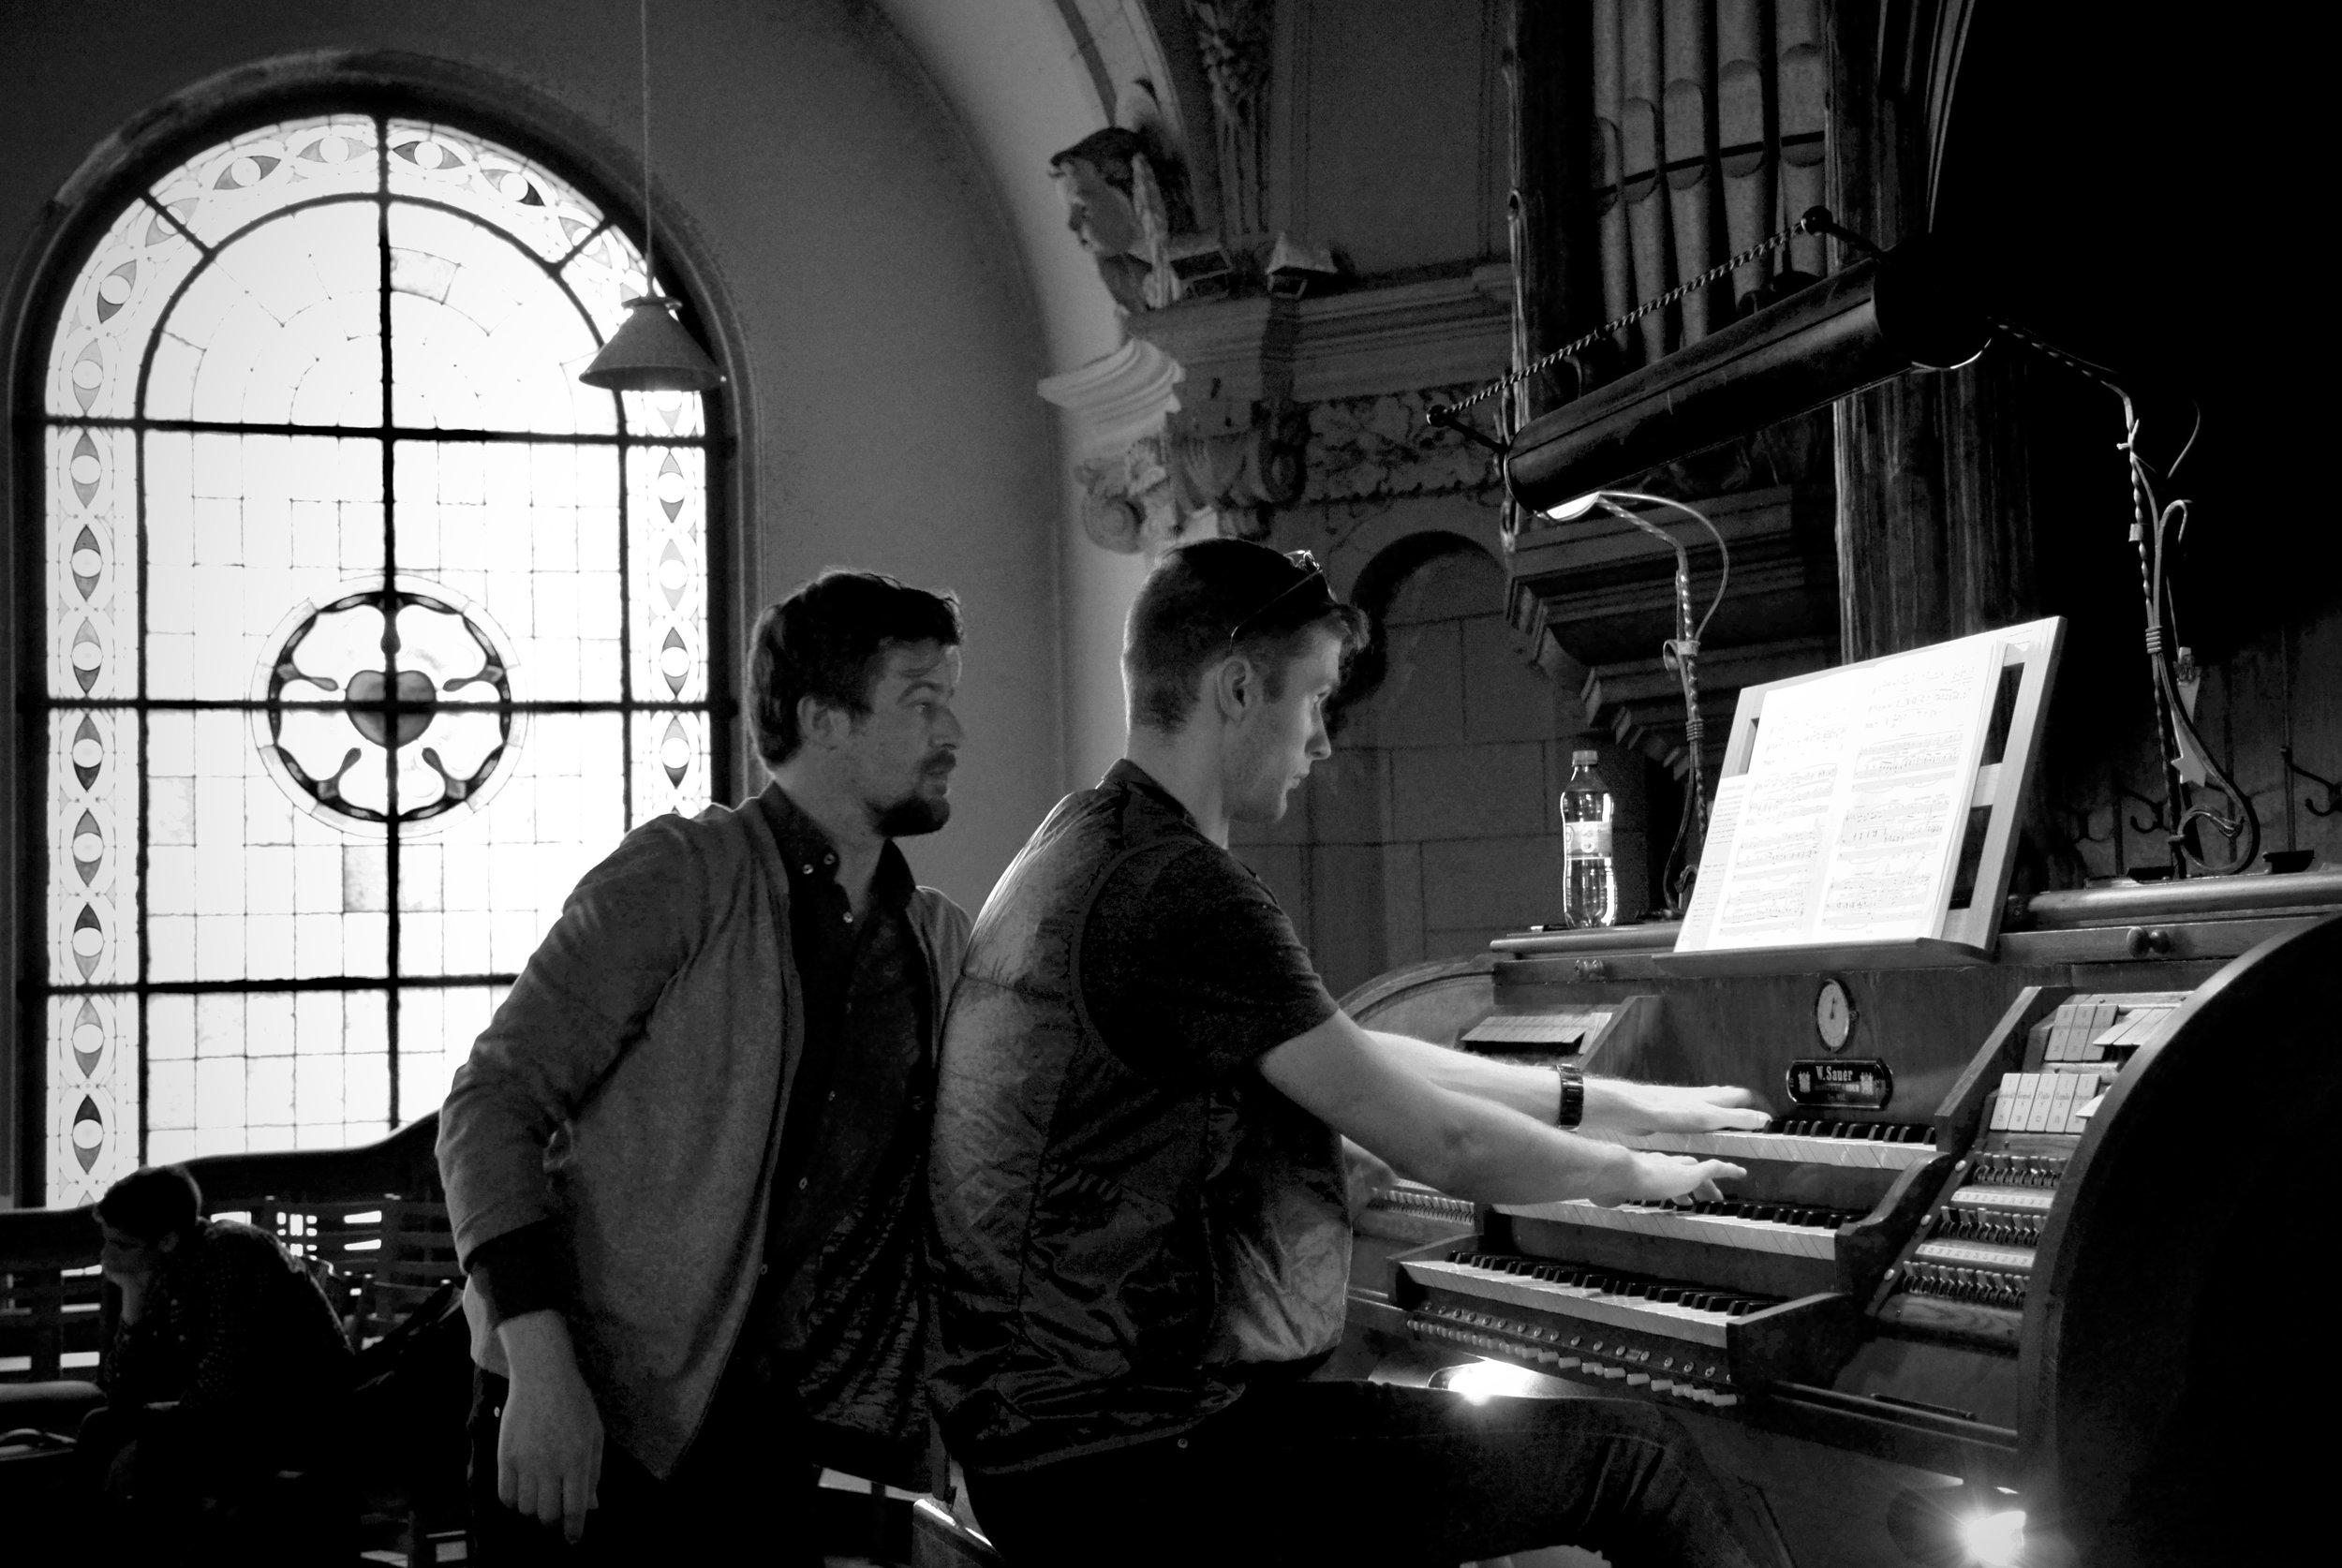 Martin Sturm assists Evan Currie, 1904 Sauer Organ, Michaeliskirche, Leipzig